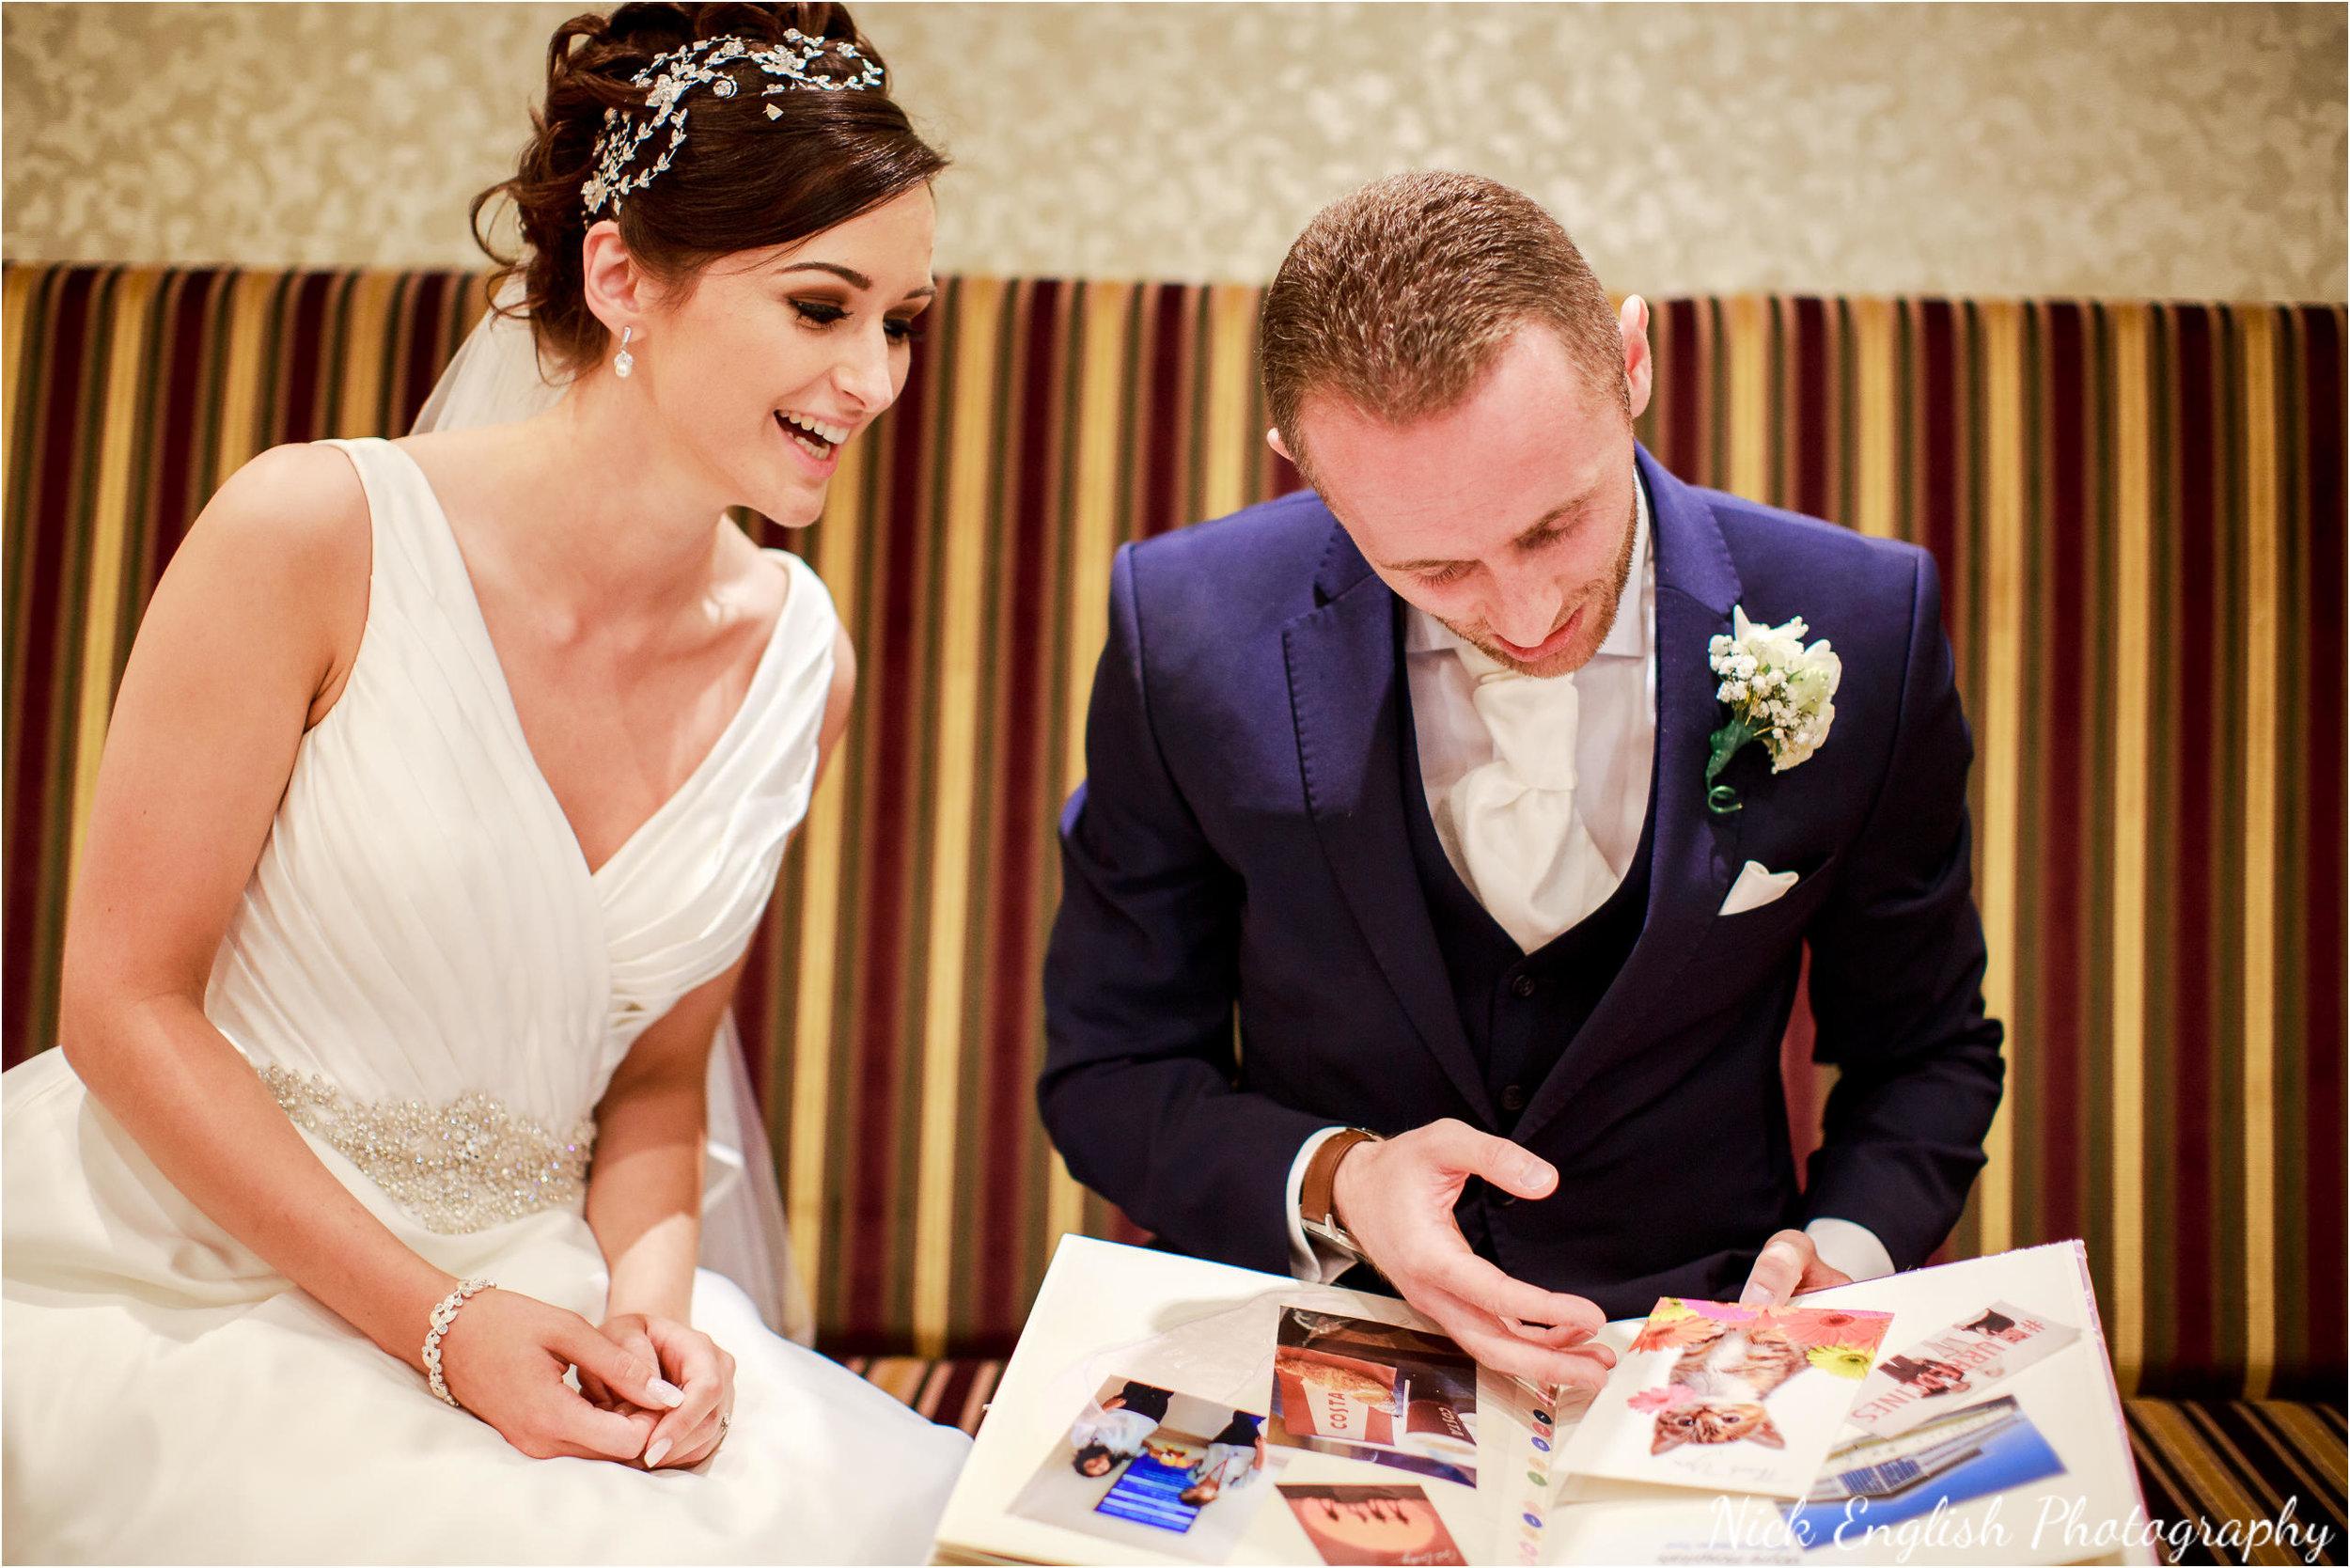 Emily David Wedding Photographs at Barton Grange Preston by Nick English Photography 162jpg.jpeg